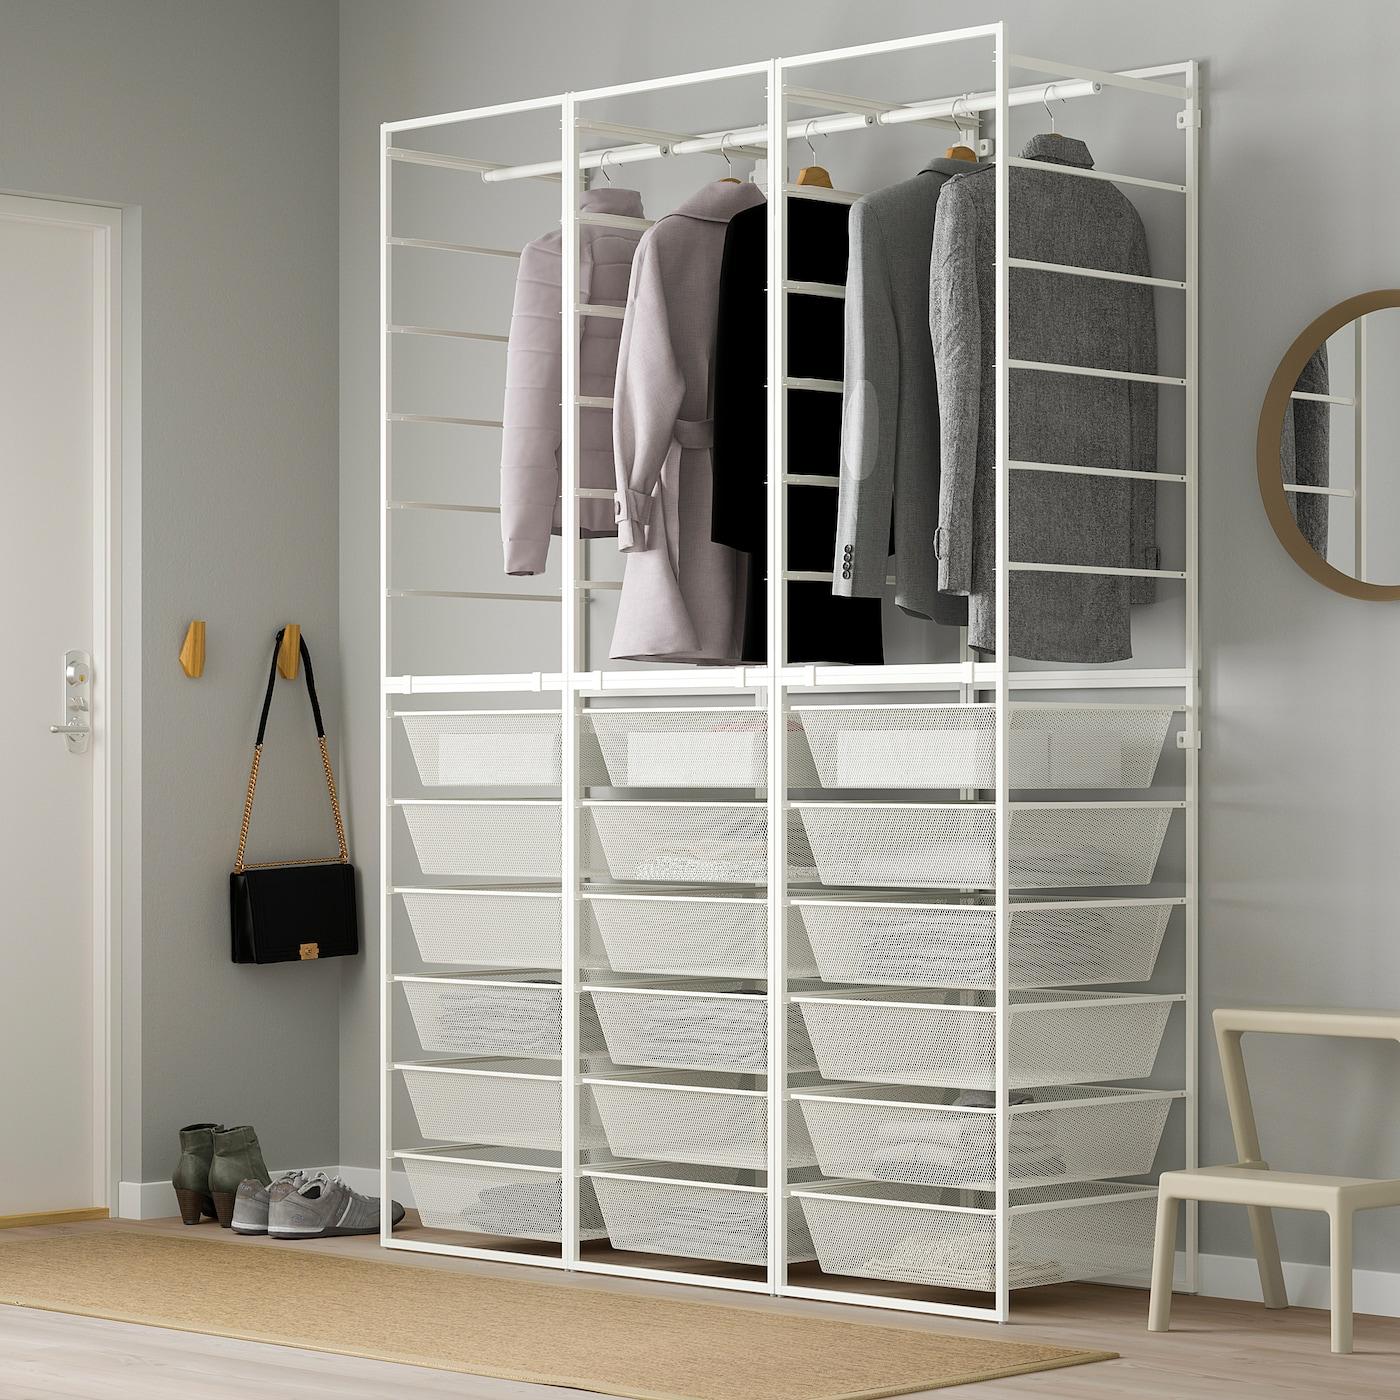 JONAXEL Garderobskombination, vit, 148x51x207 cm